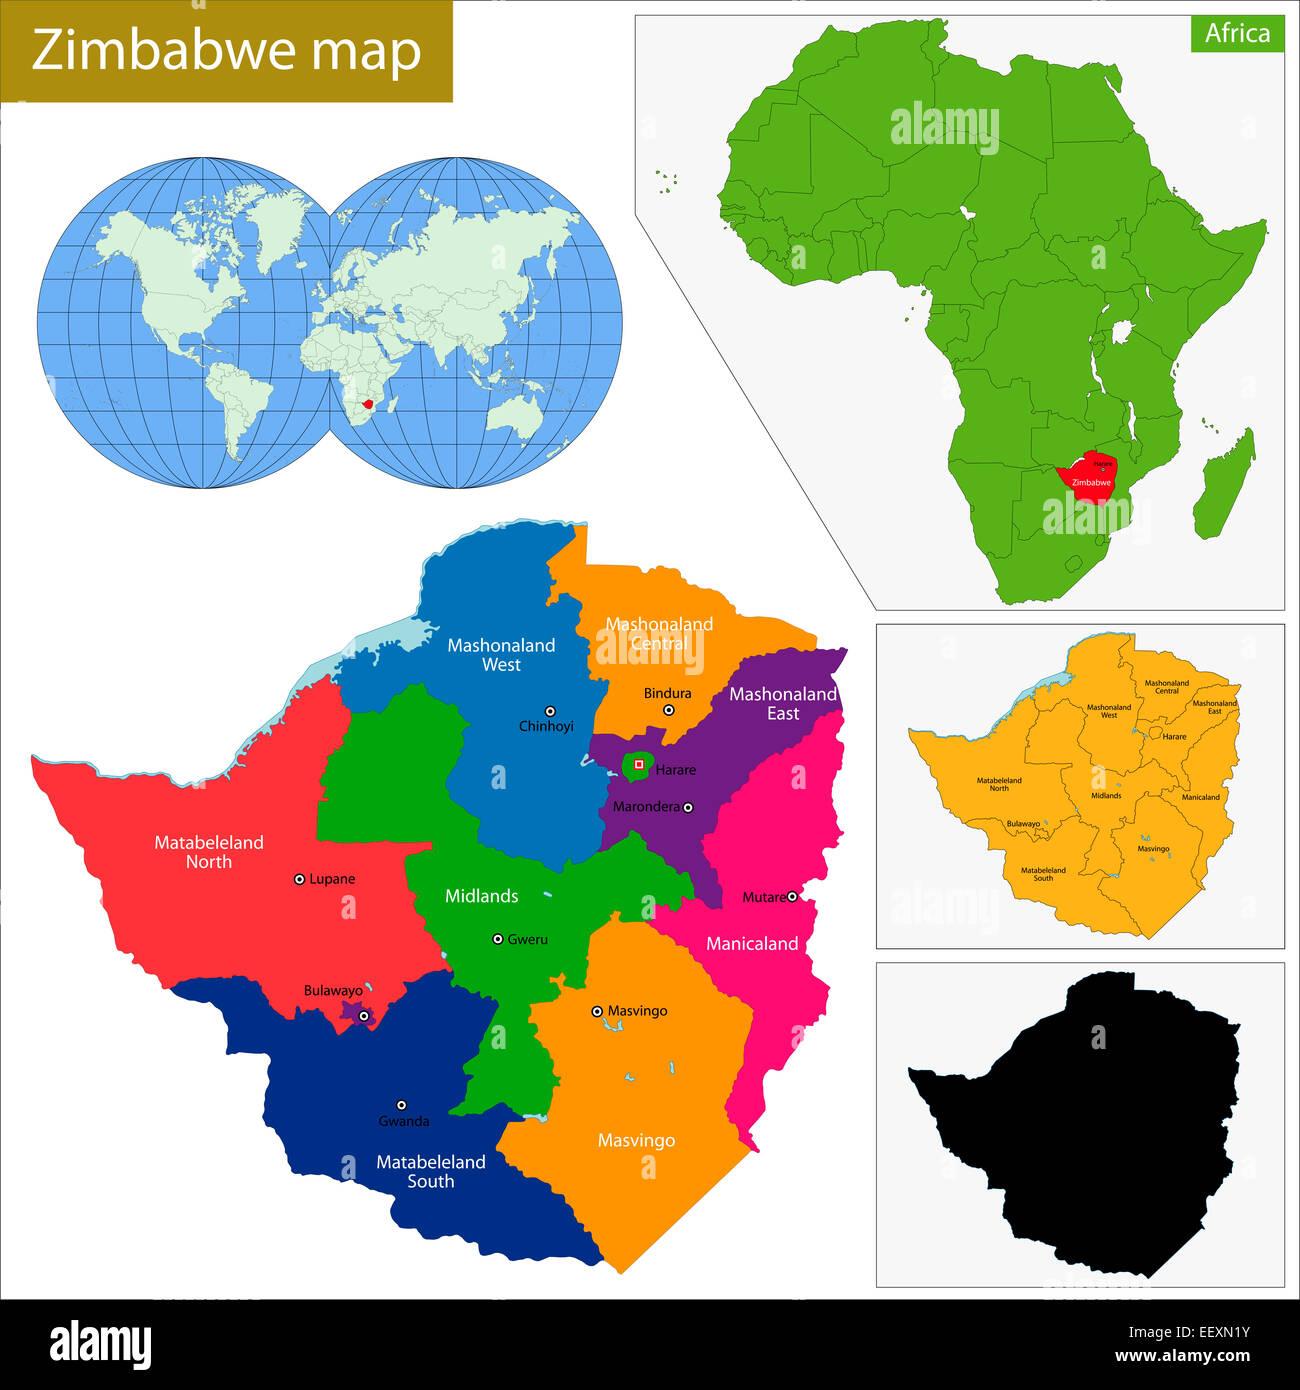 Zimbabwe map Stock Photo: 78033927 - Alamy on eritrea map, prussia map, algeria map, harare map, mozambique map, rhodesia map, lesotho map, senegal map, tunisia map, israel map, united nations map, zambia map, kenya map, madagascar map, liberia map, world map, ethiopia map, tanzania map, niger map, uganda map, sudan map, angola map, malawi map, mali map, africa map, cameroon map, kosovo map, albania map, ghana map, libya map, namibia map, victoria falls map, uzbekistan map, morocco map, luxembourg map, rwanda map,